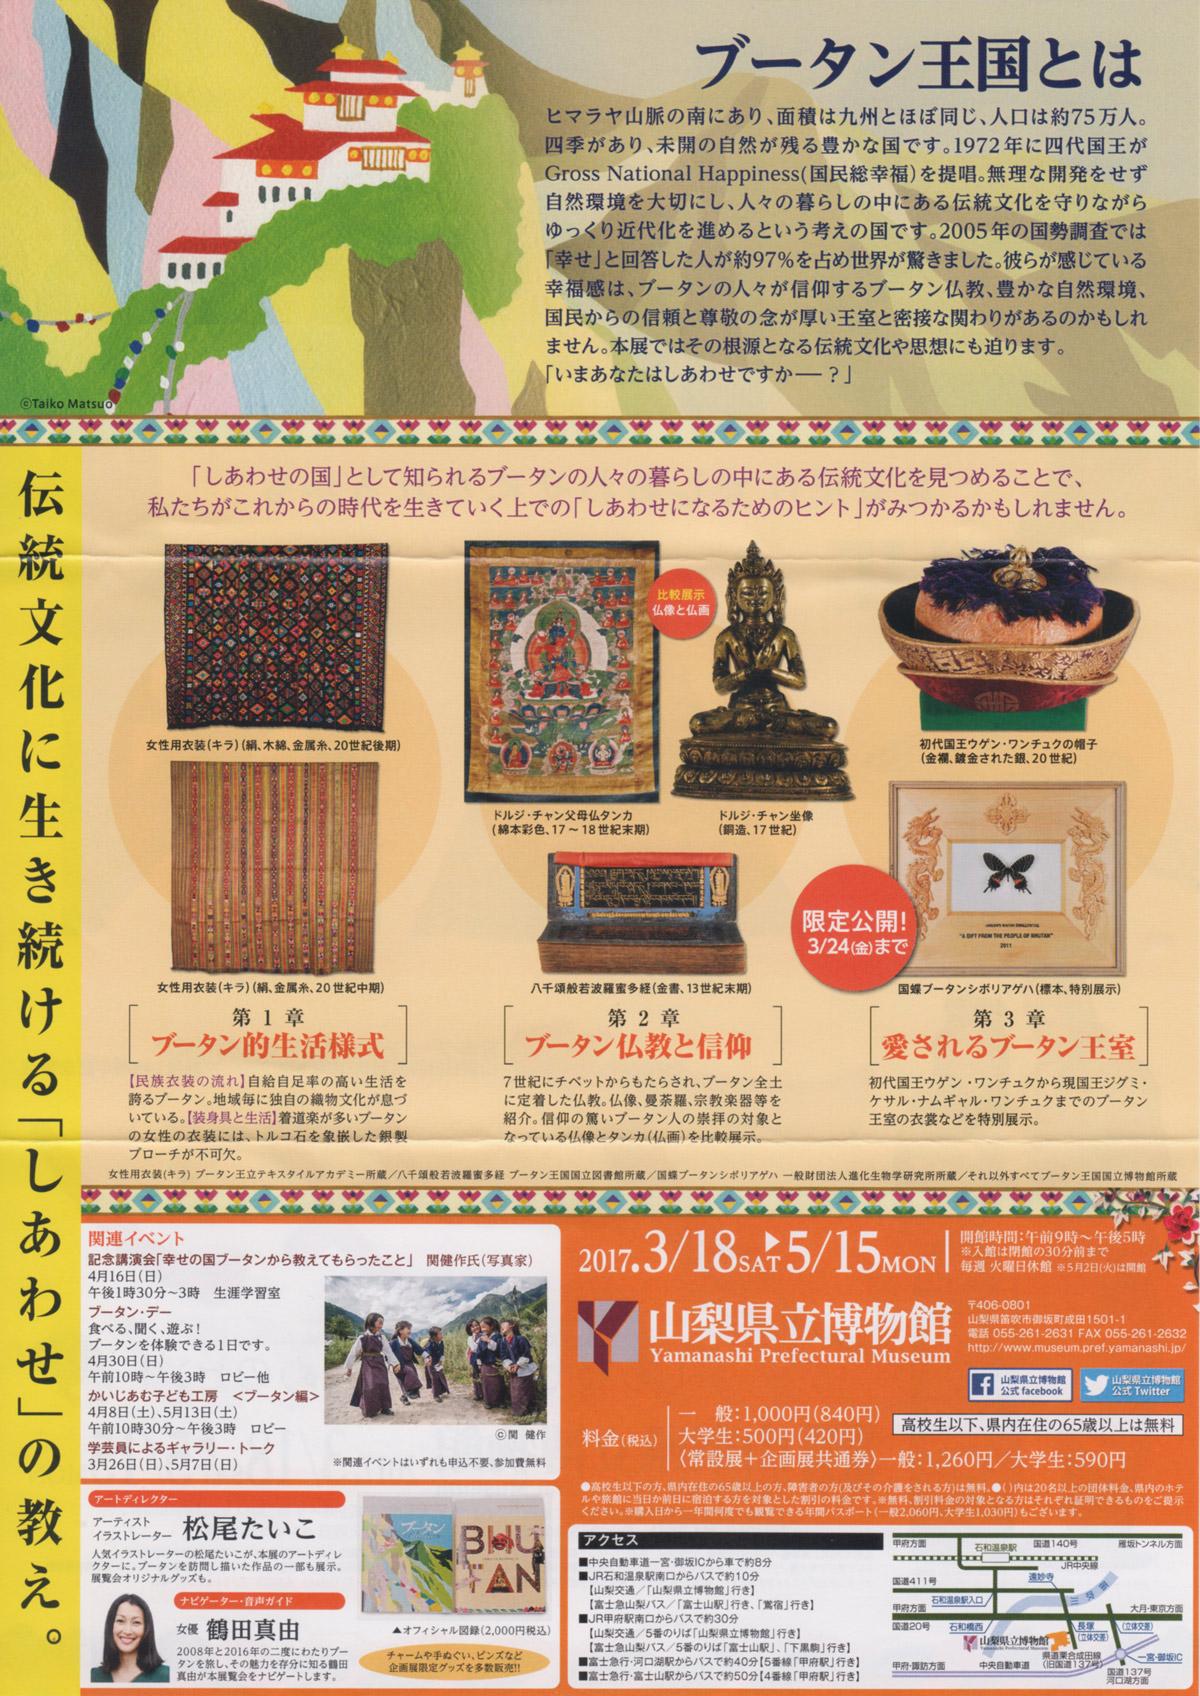 2017kenhaku_bhutan02-1bnr